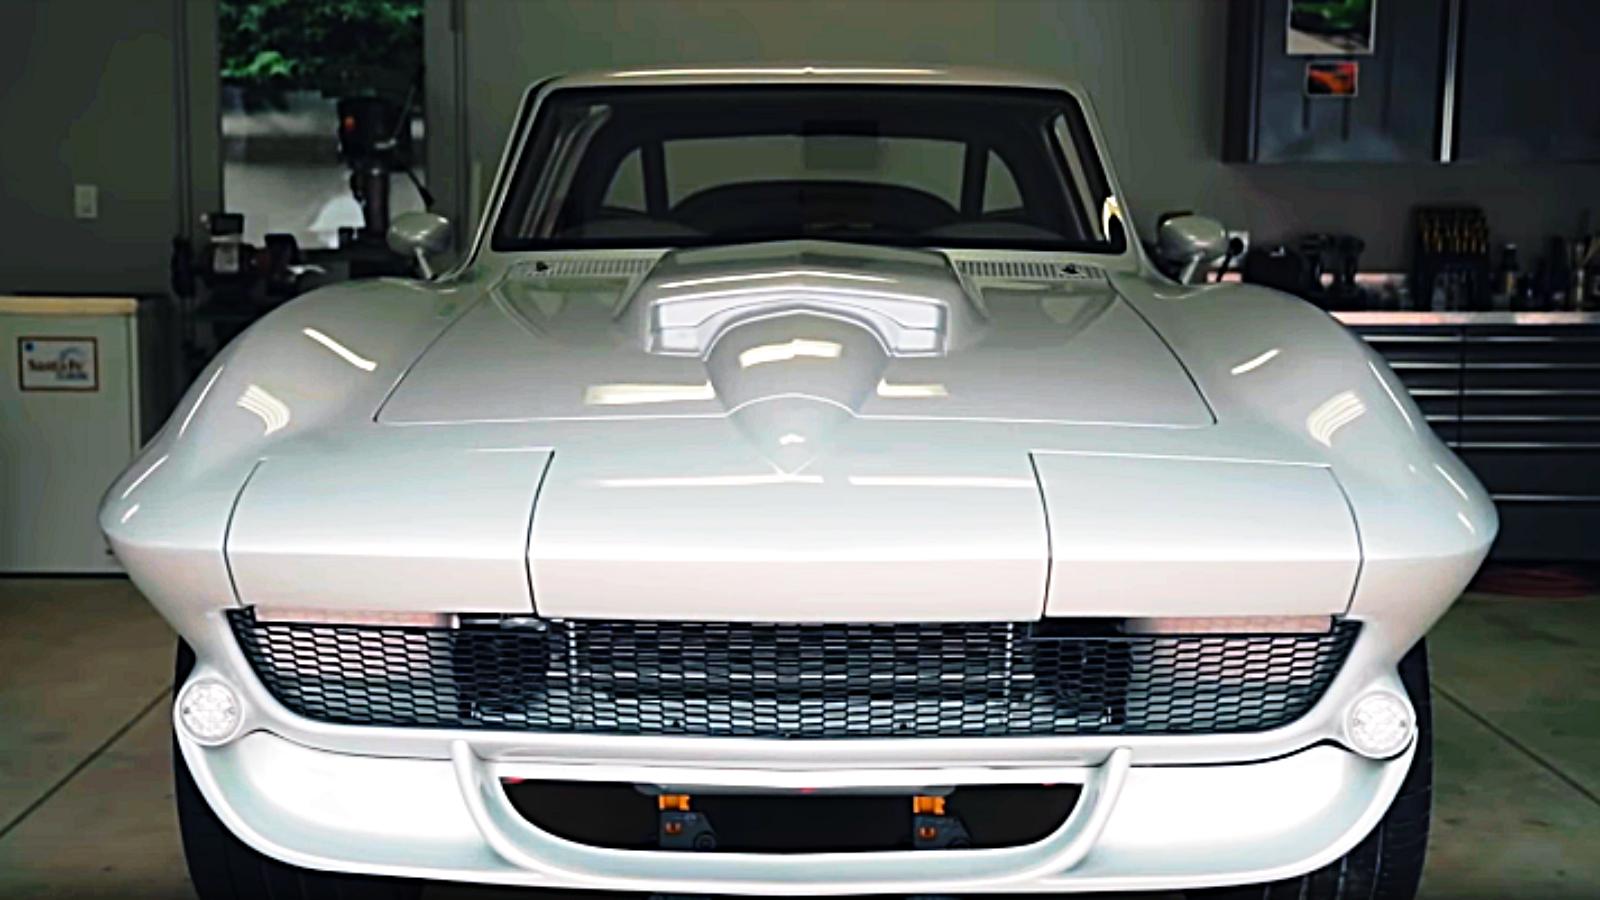 2018 SEMA Battle of the Builders: 1966 Corvette